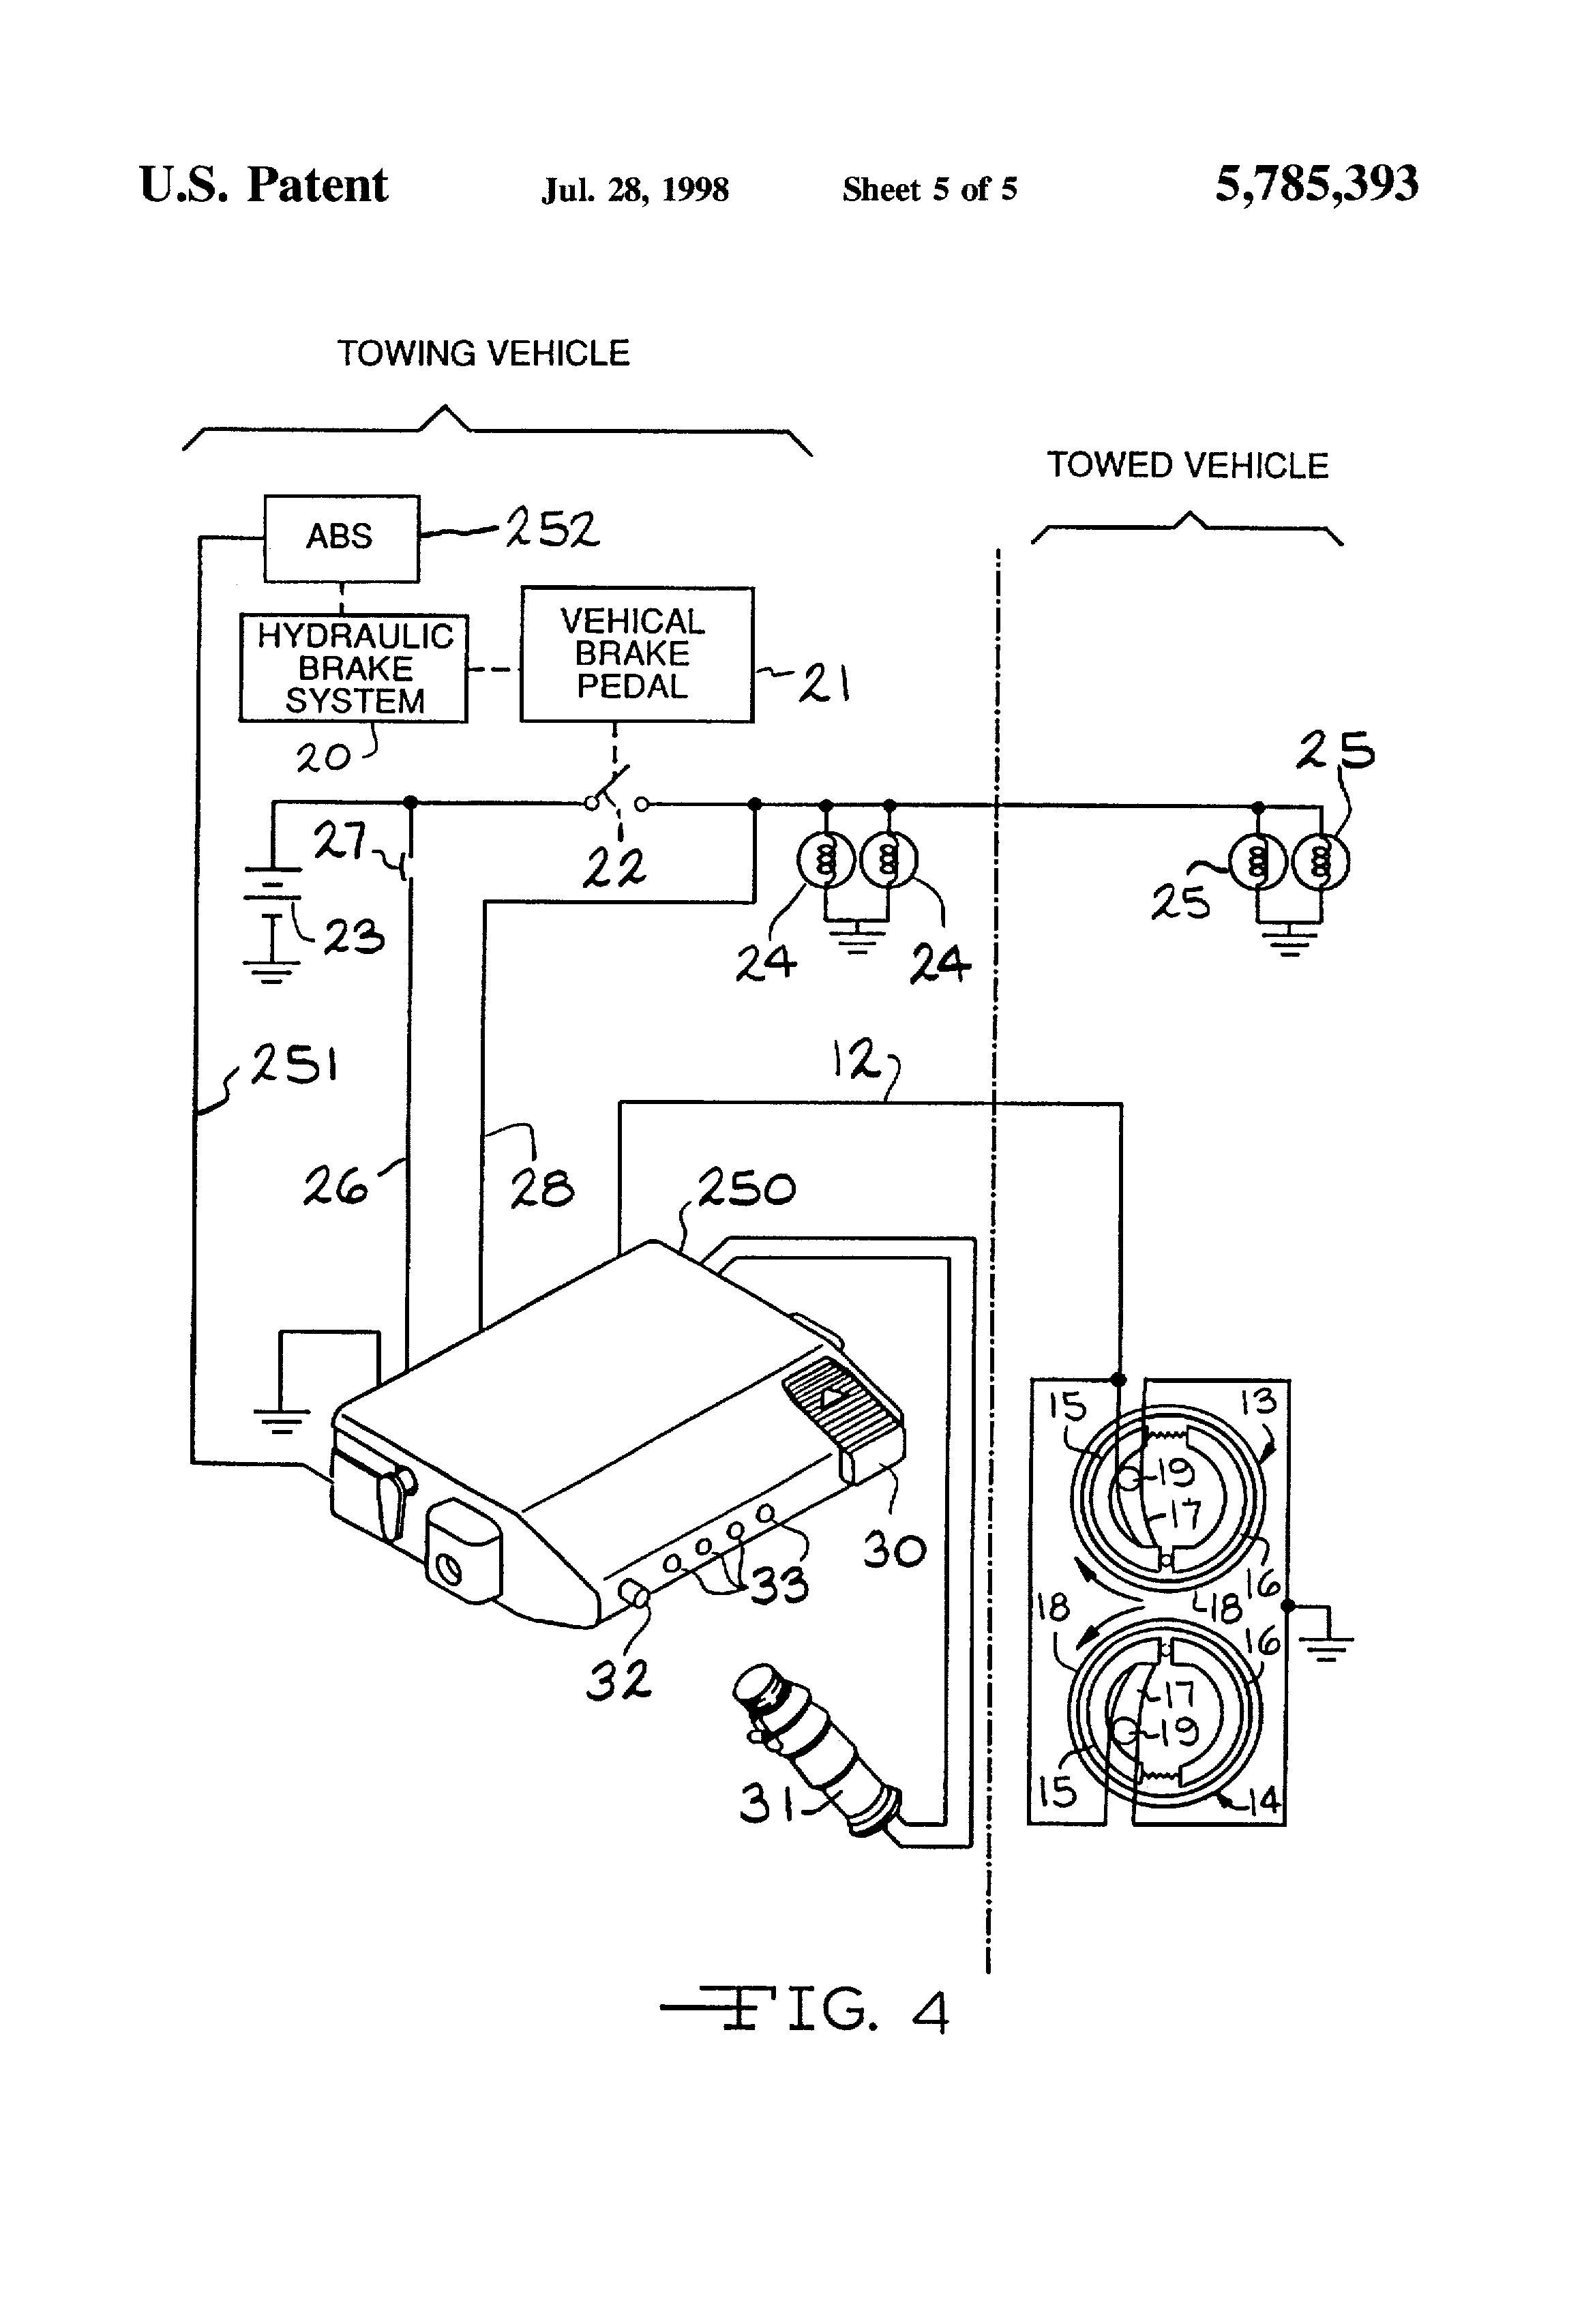 Wiring Diagram For Trailer Brake Controller Best Breakaway Trailer Brake Wiring Diagram Trailer Brake Controller